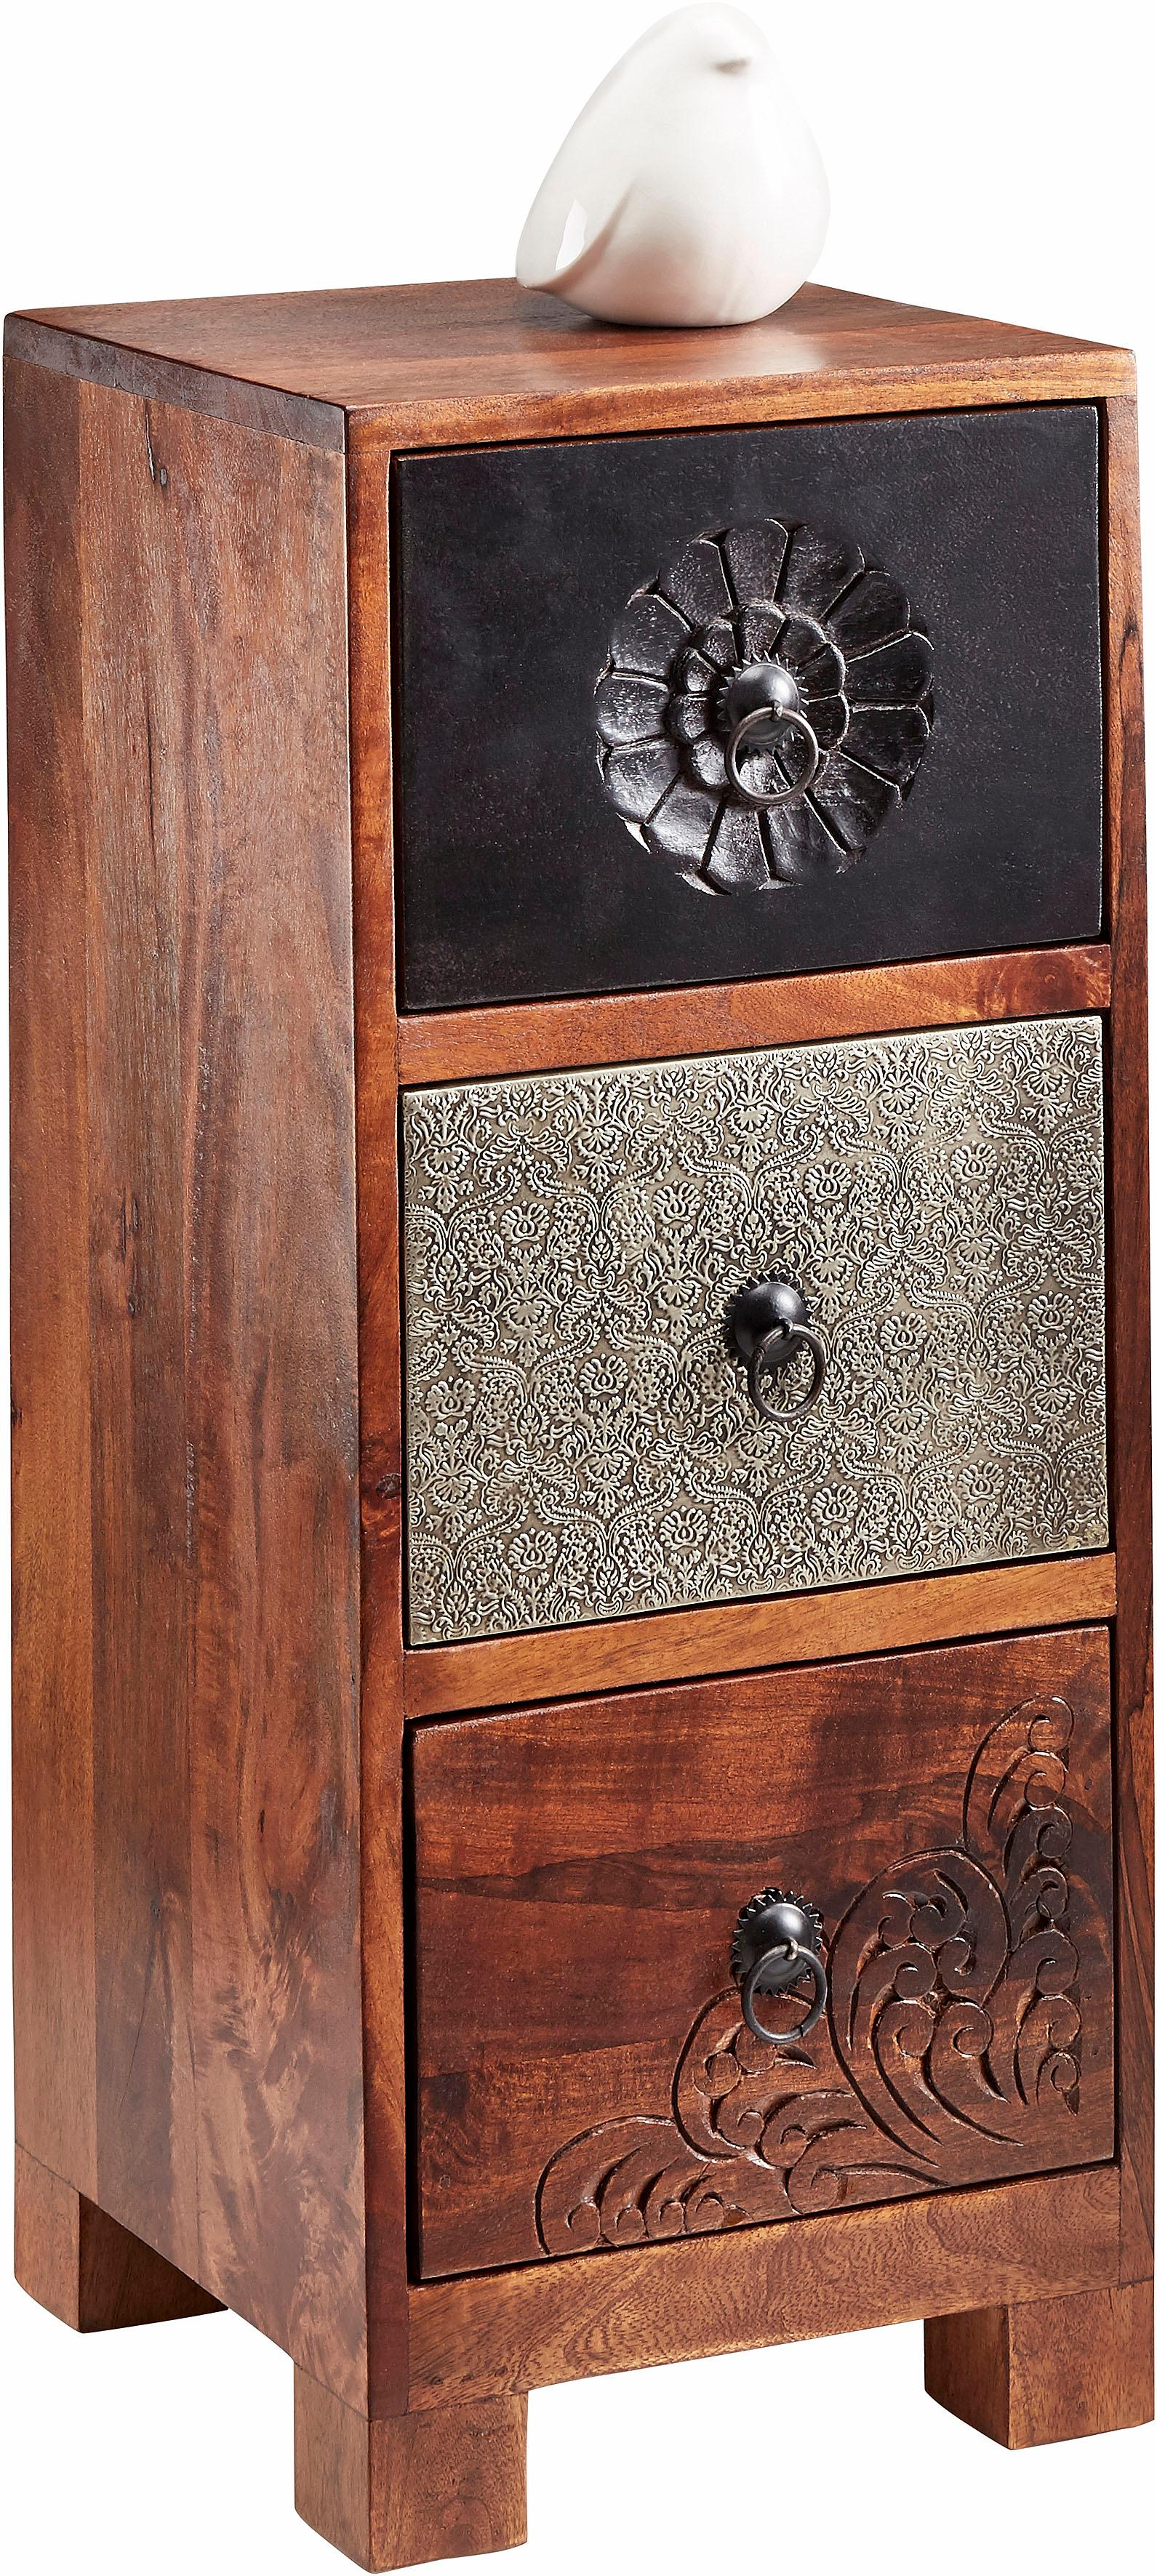 kommode 30 cm tief preisvergleich die besten angebote. Black Bedroom Furniture Sets. Home Design Ideas